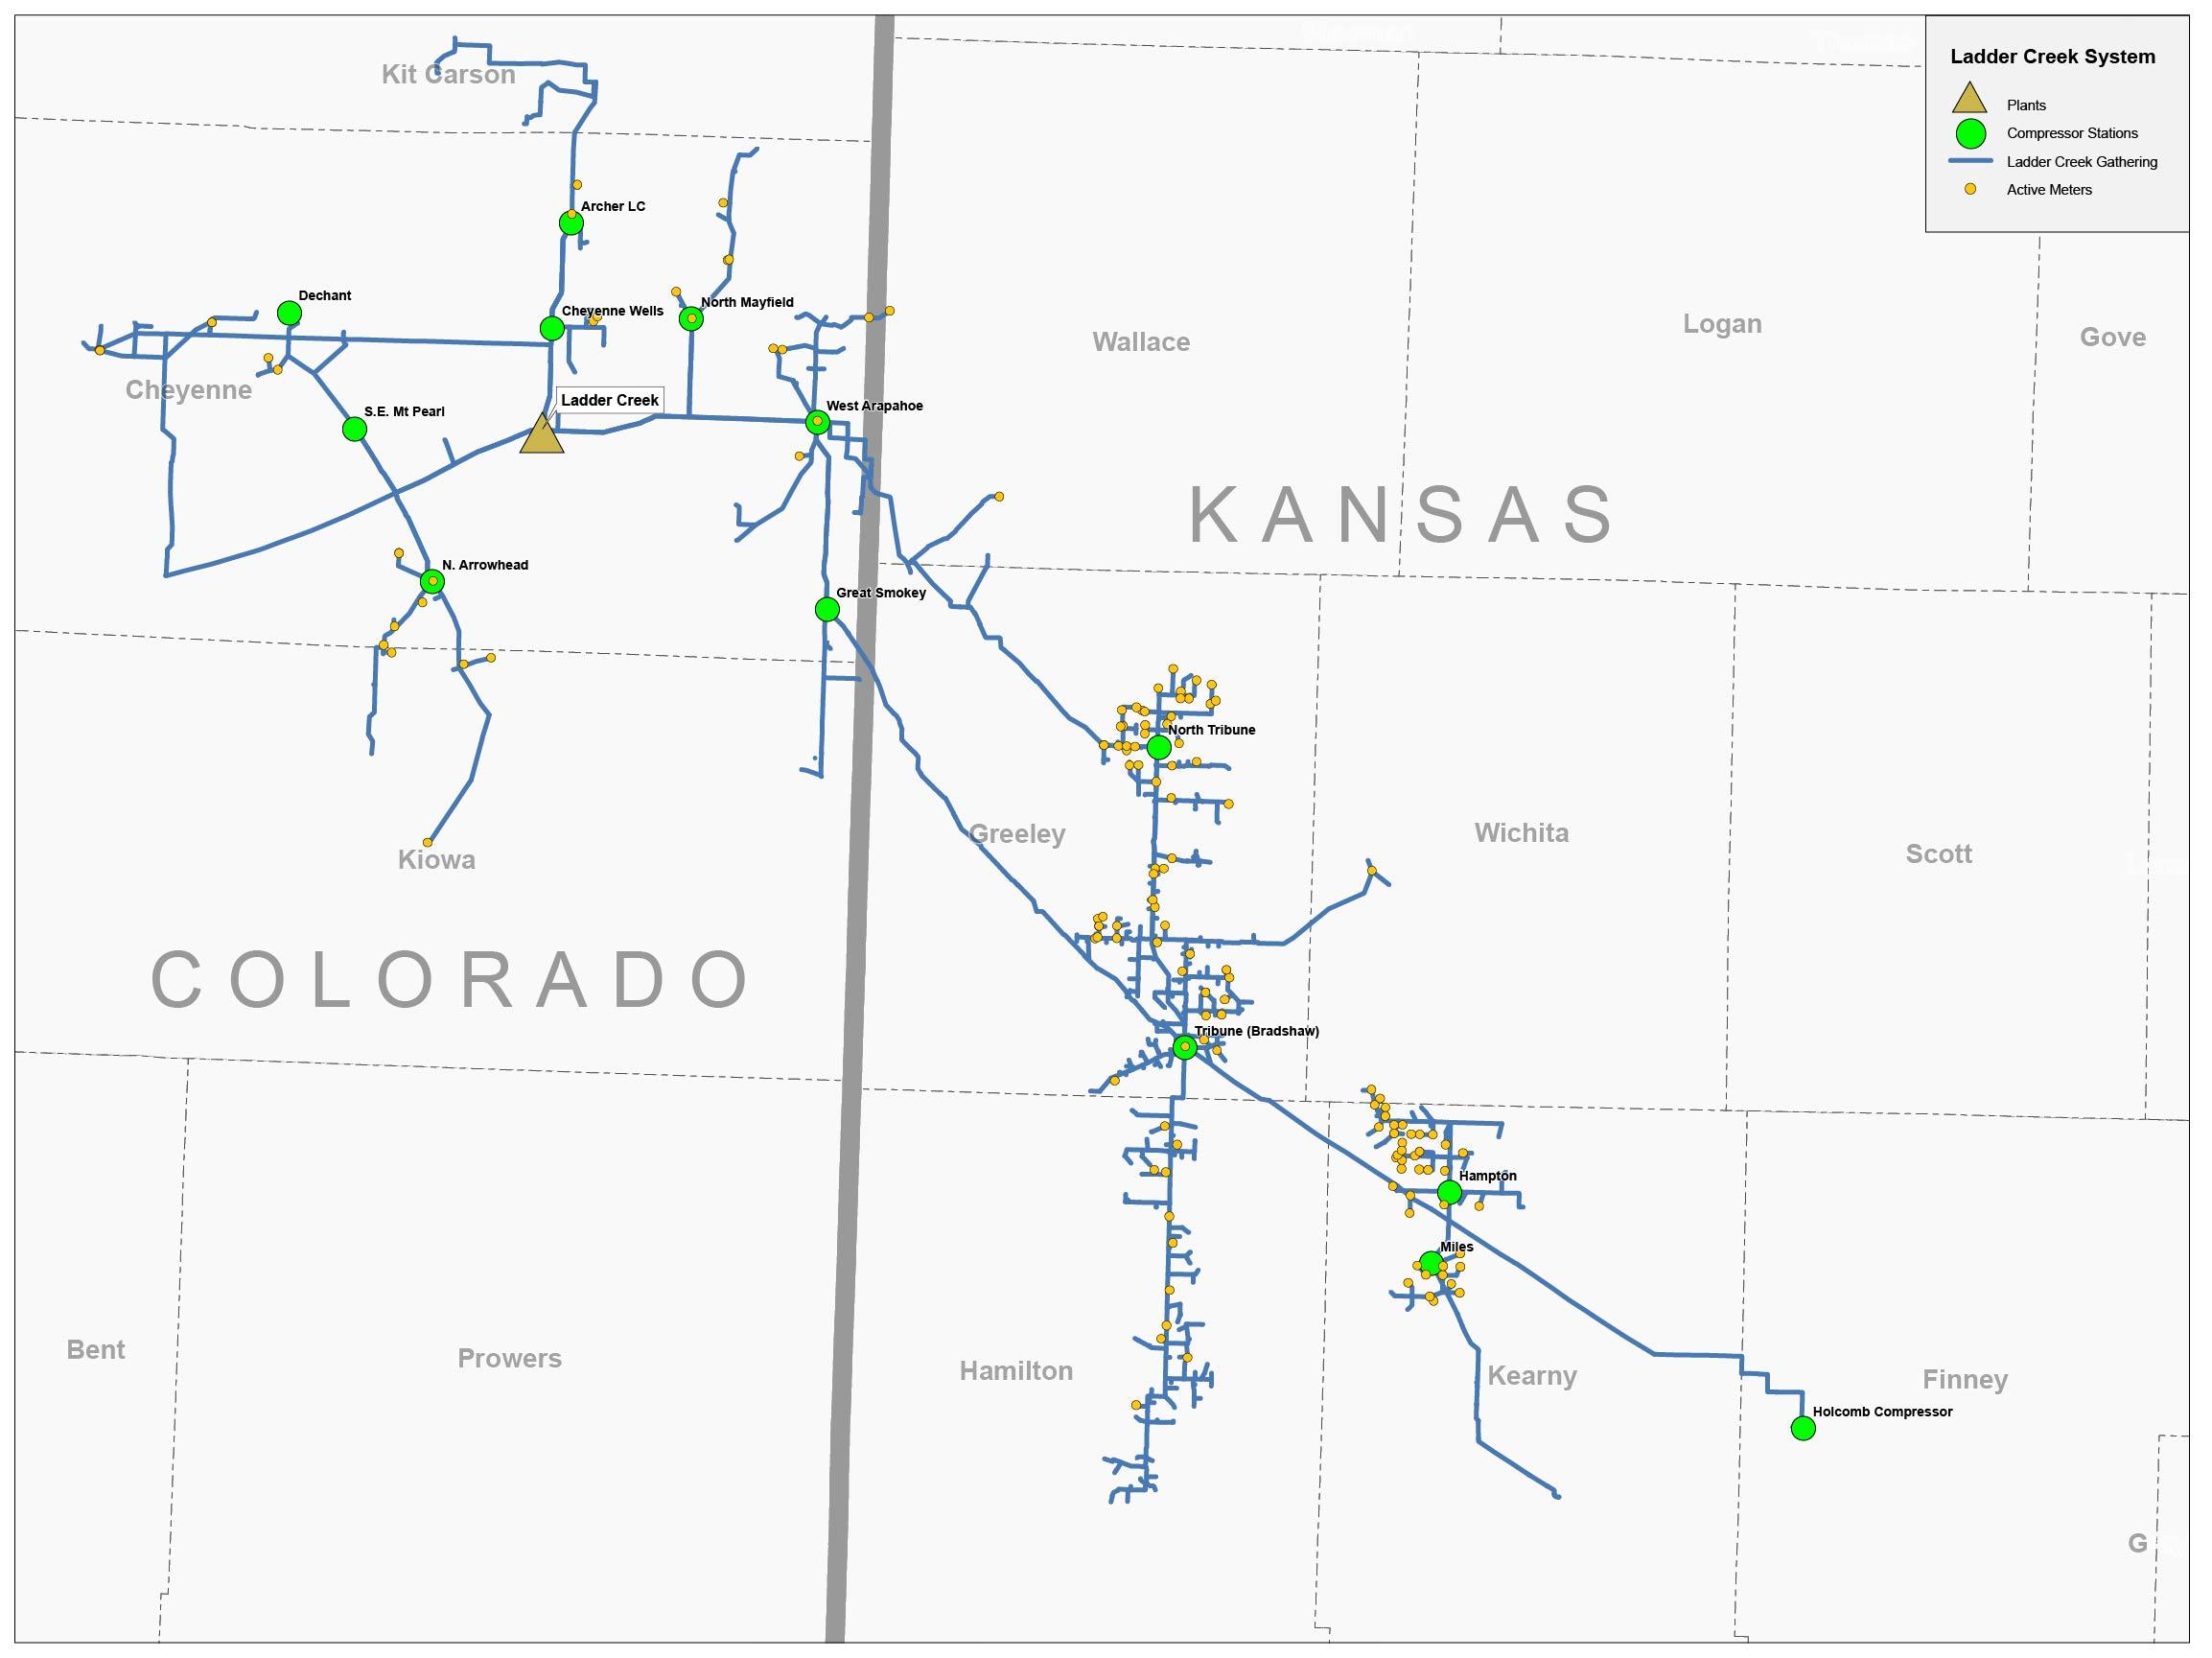 MAP Ladder Creek System